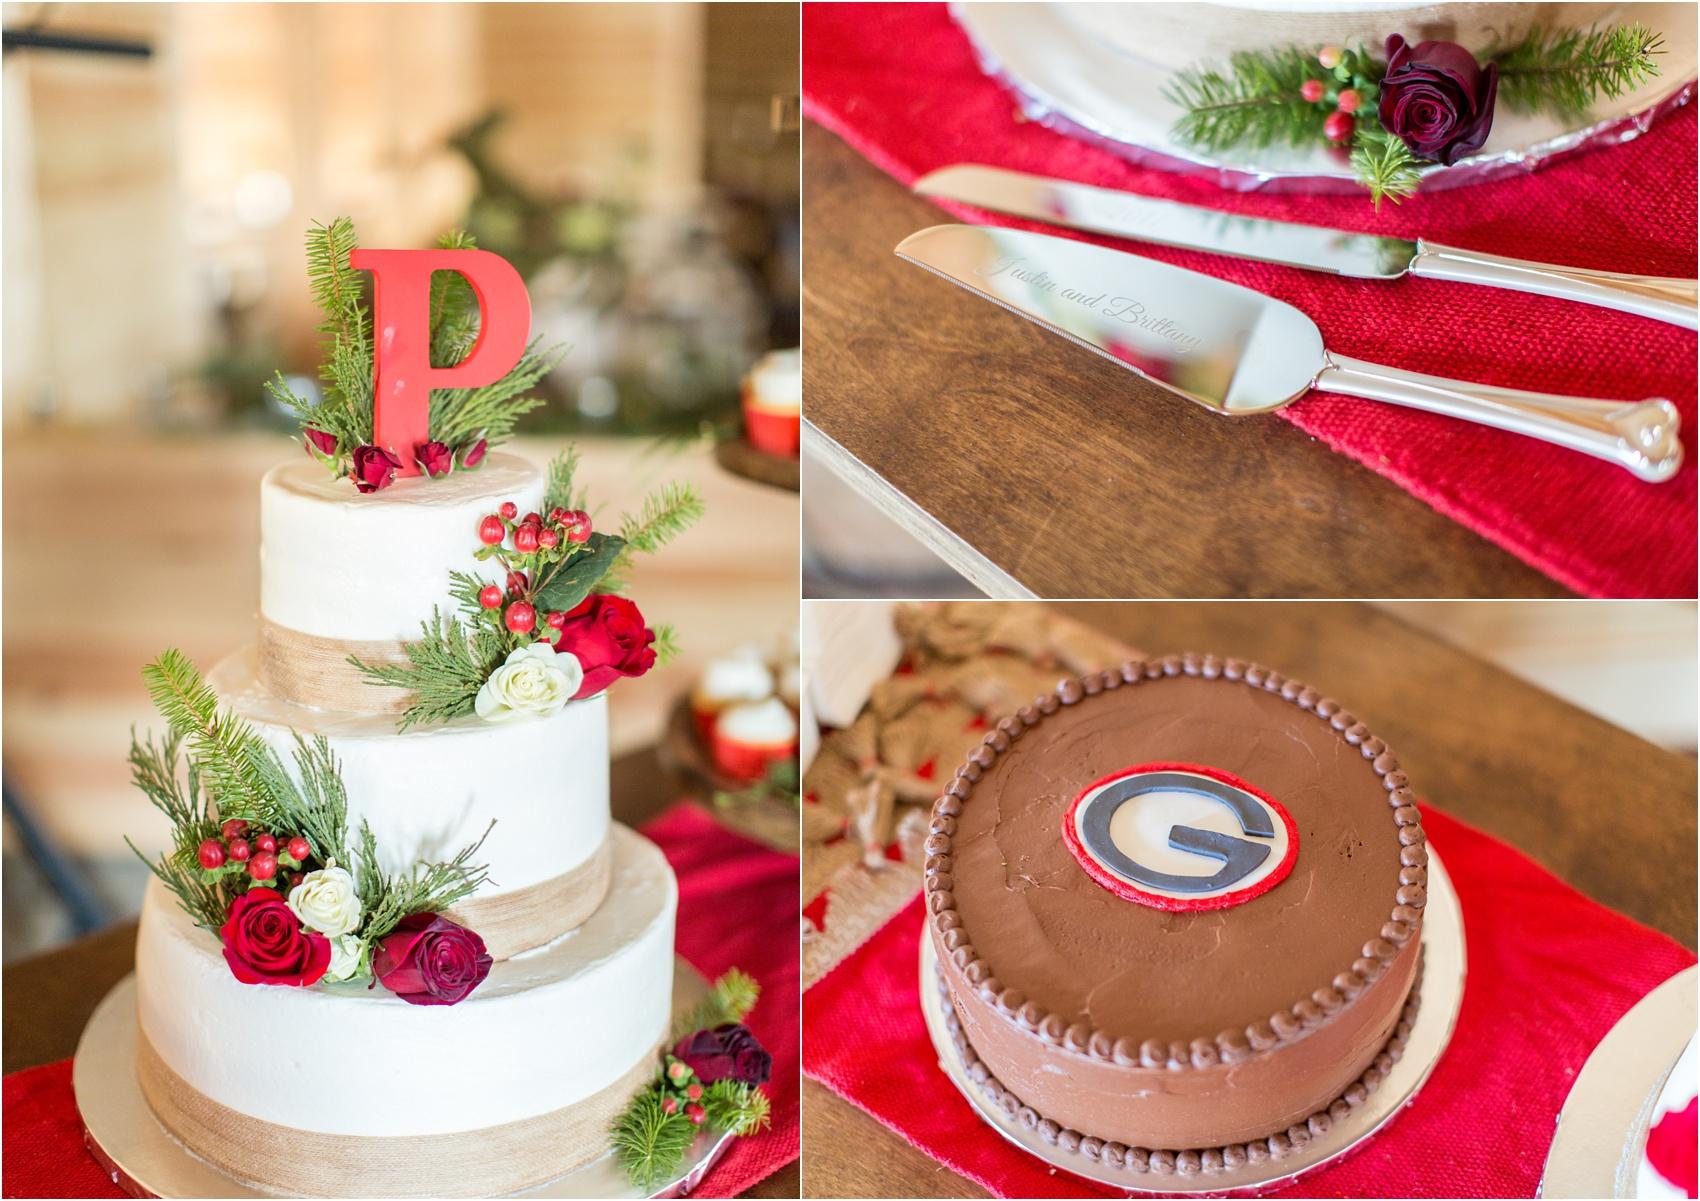 Savannah Eve Photography- Page Wedding Blog-51.jpg